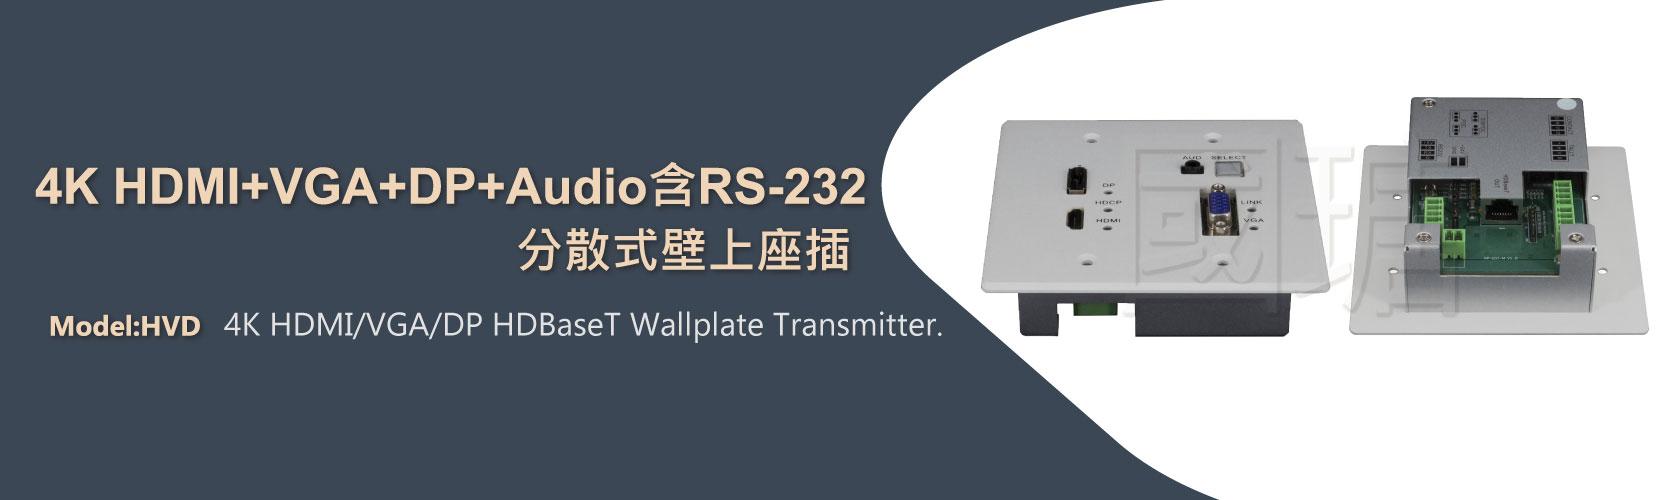 2021 4K HDMI、DP、VGA分散式延伸壁上座插, HDBaseT延伸技術, 壁掛式影音訊號延長器 | 台灣ACAFA國瑭